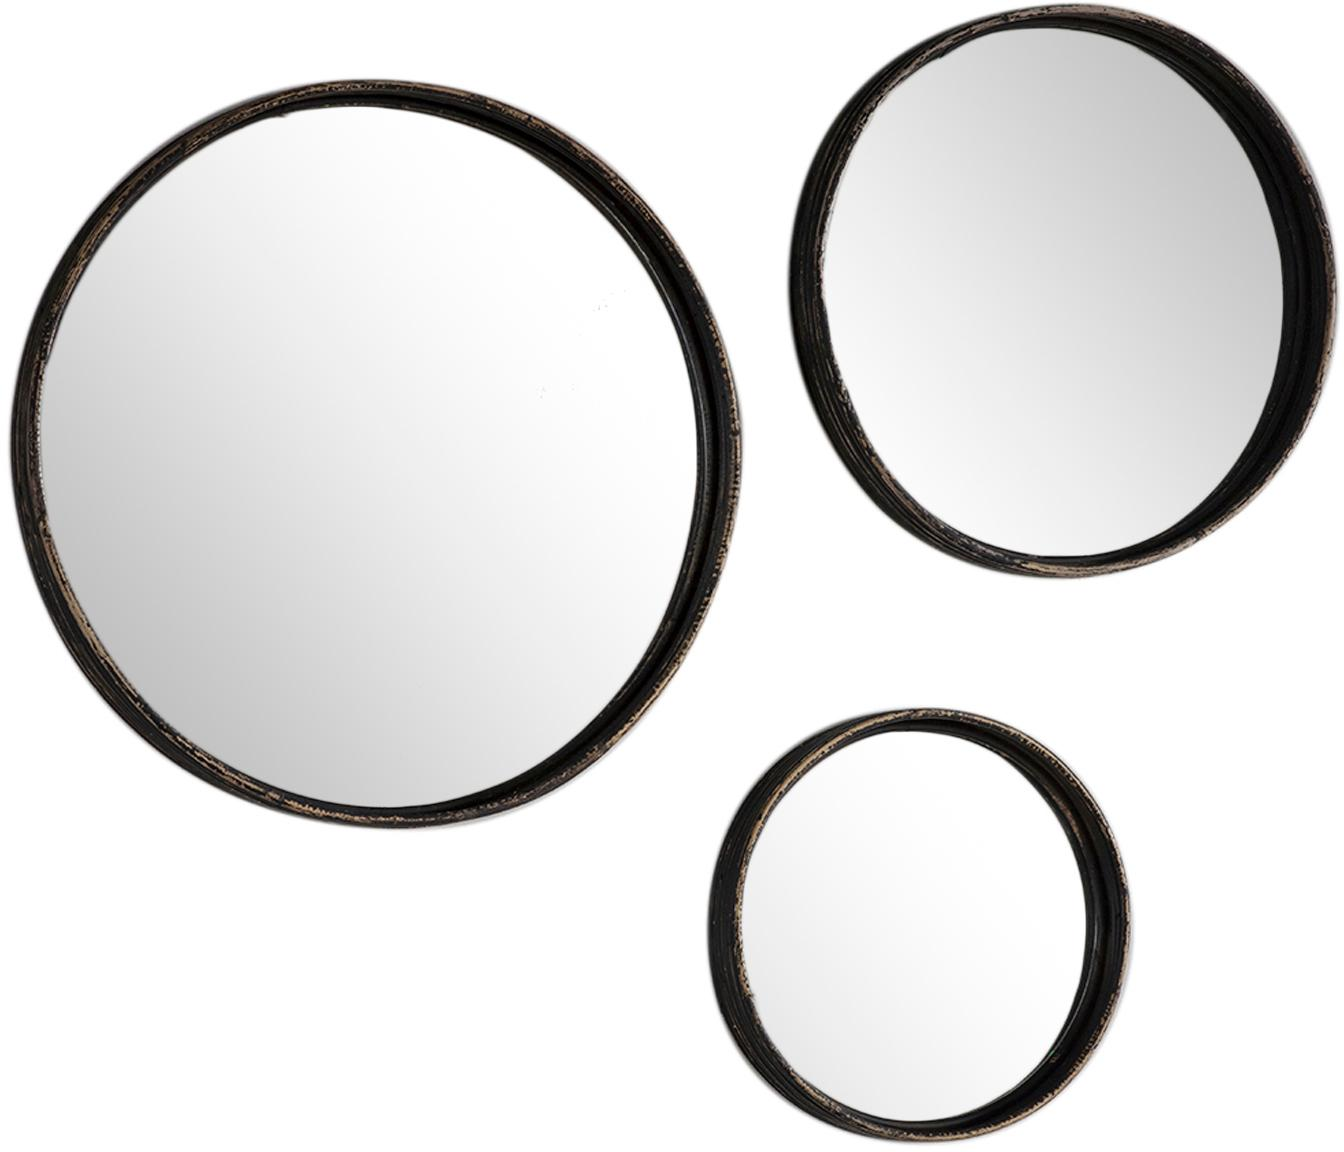 Set de espejos de pared redondos Ricos, 3pzas., Espejo: cristal, Marrón oscuro, negro, Set de diferentes tamaños